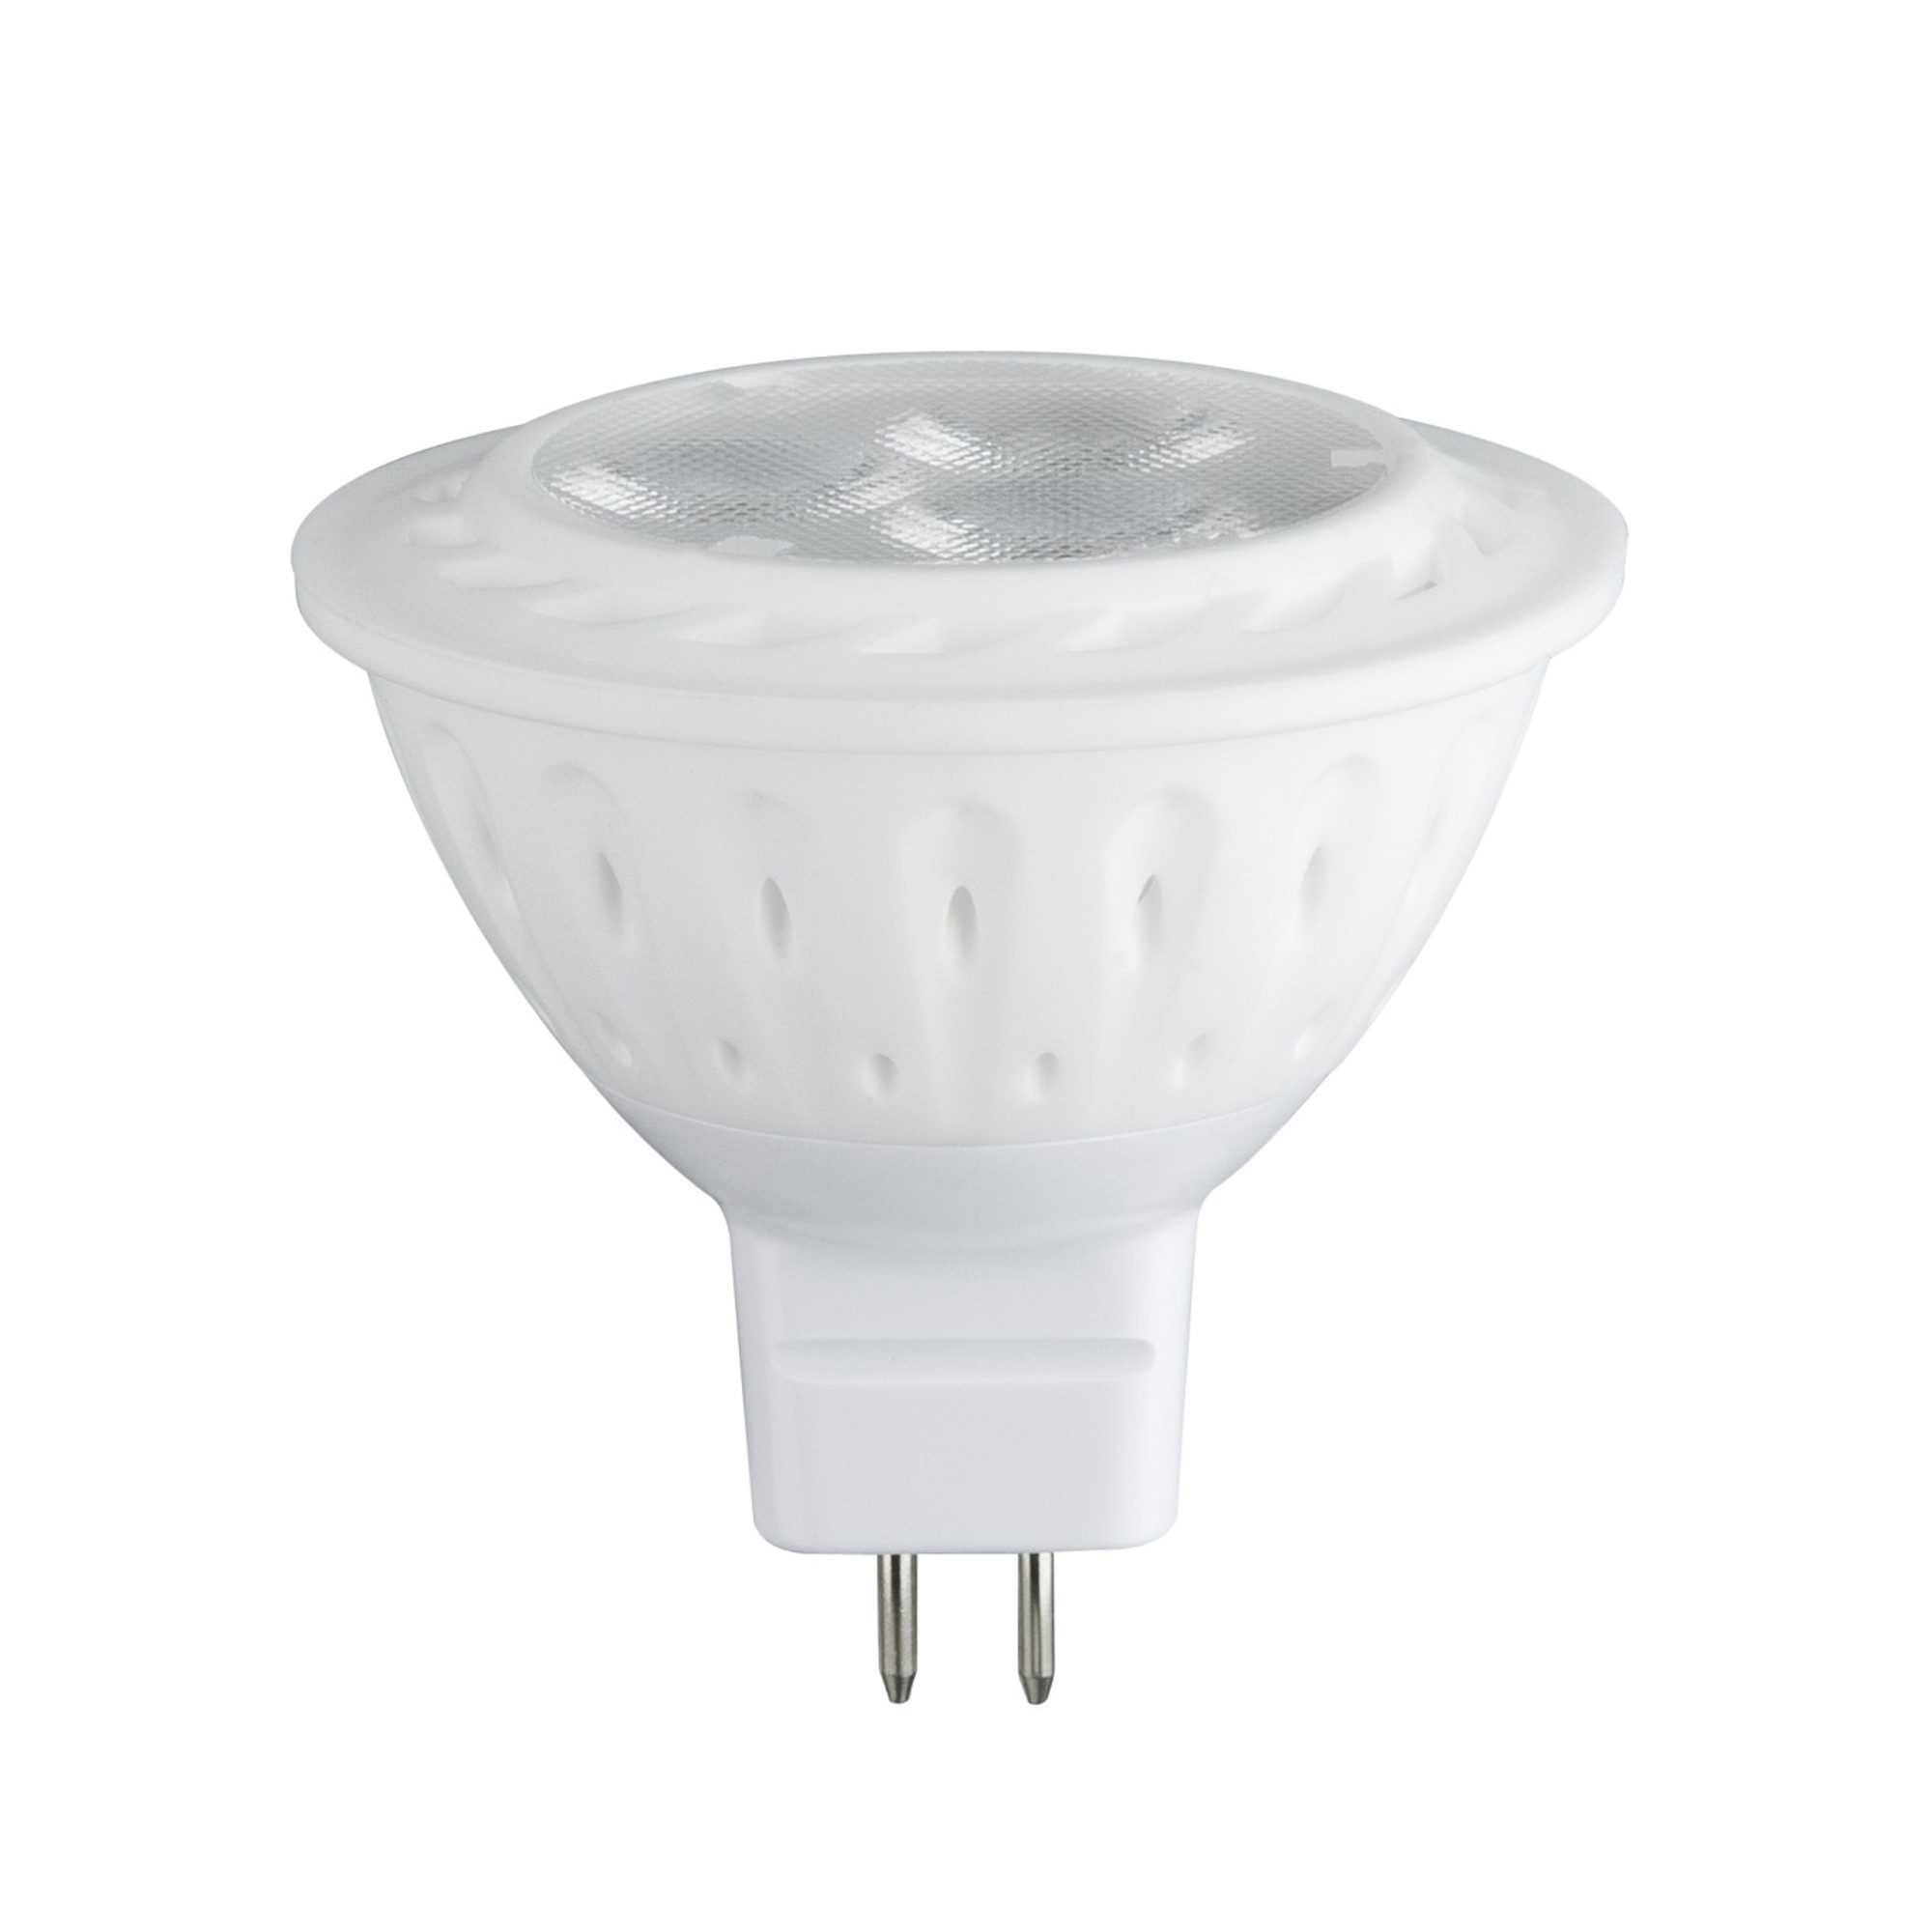 Лампа светодиодная Paulmann 28135 GU5.3 210 Лм теплый свет